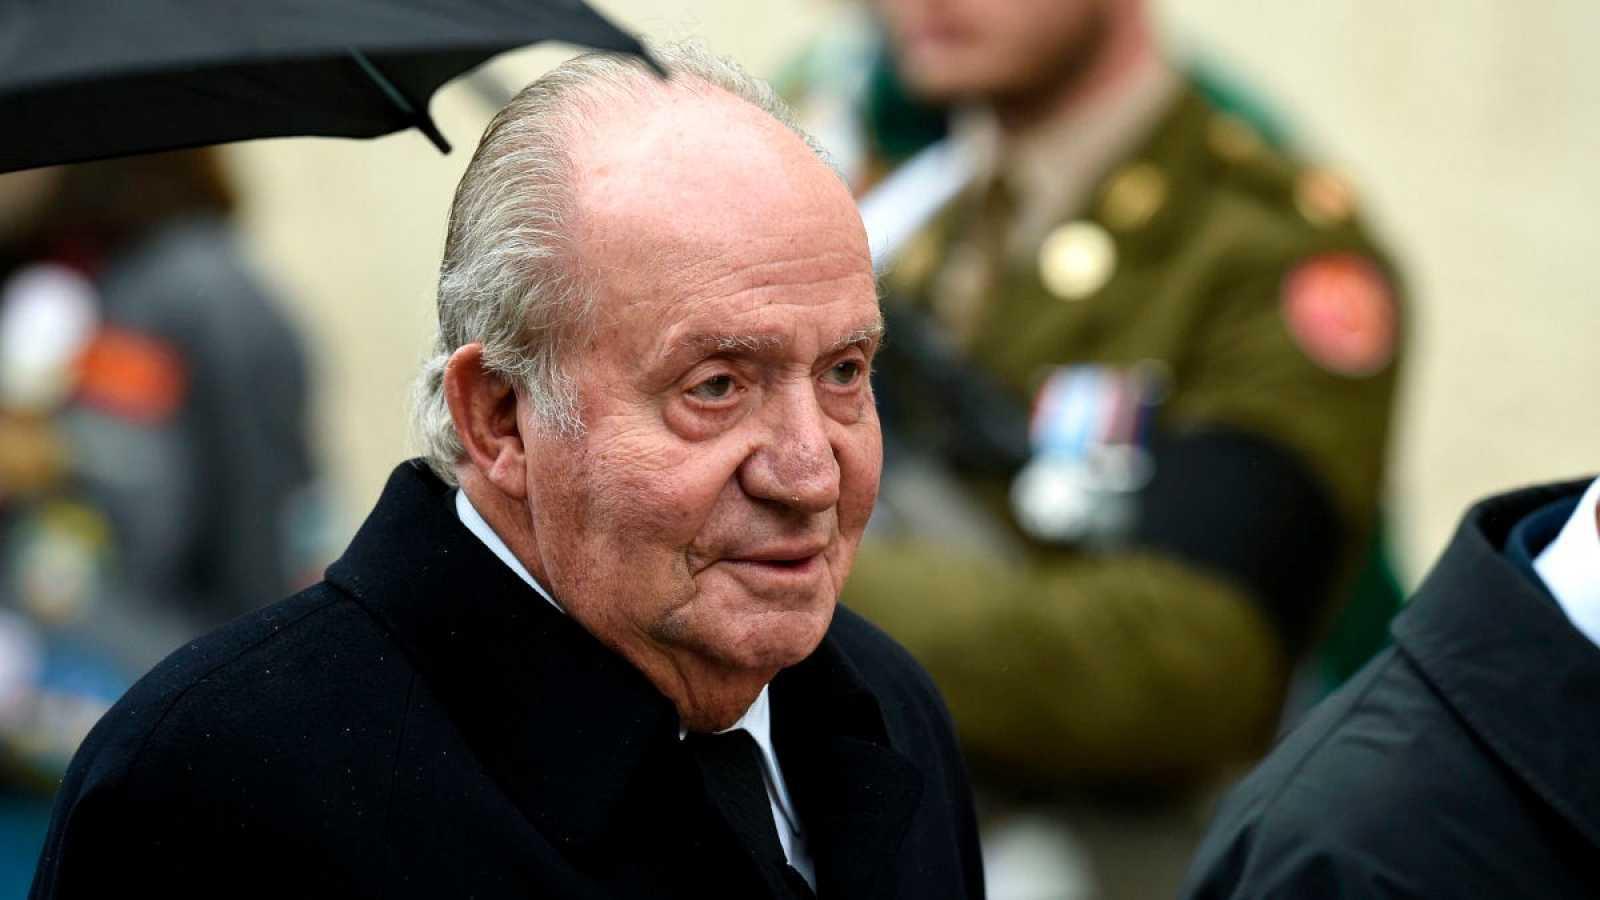 Crece la incertidumbre sobre el destino del rey Juan Carlos